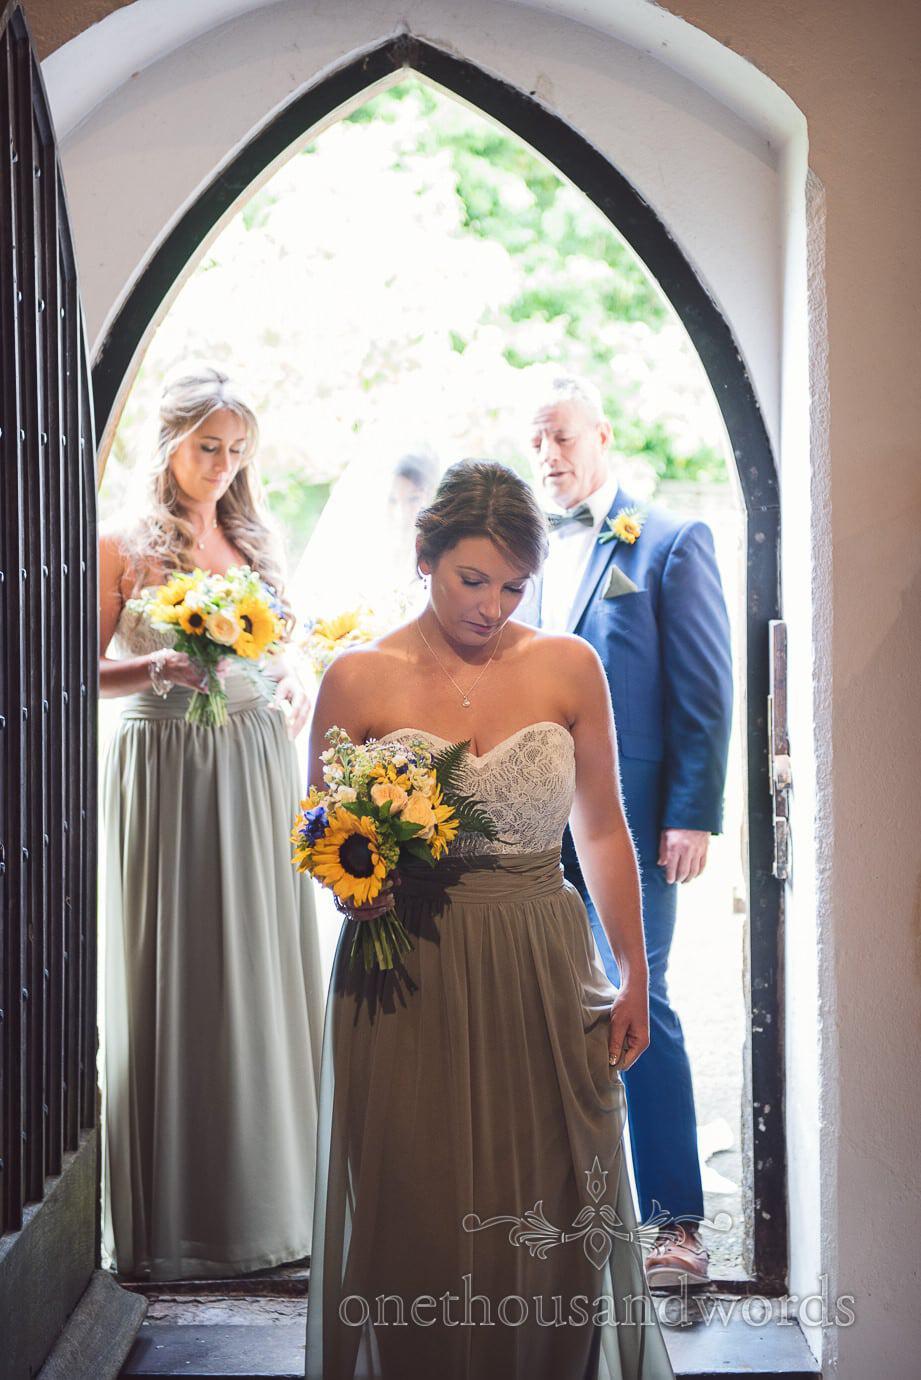 Bridesmaid in dusty green dress enters English church wedding in Dorset